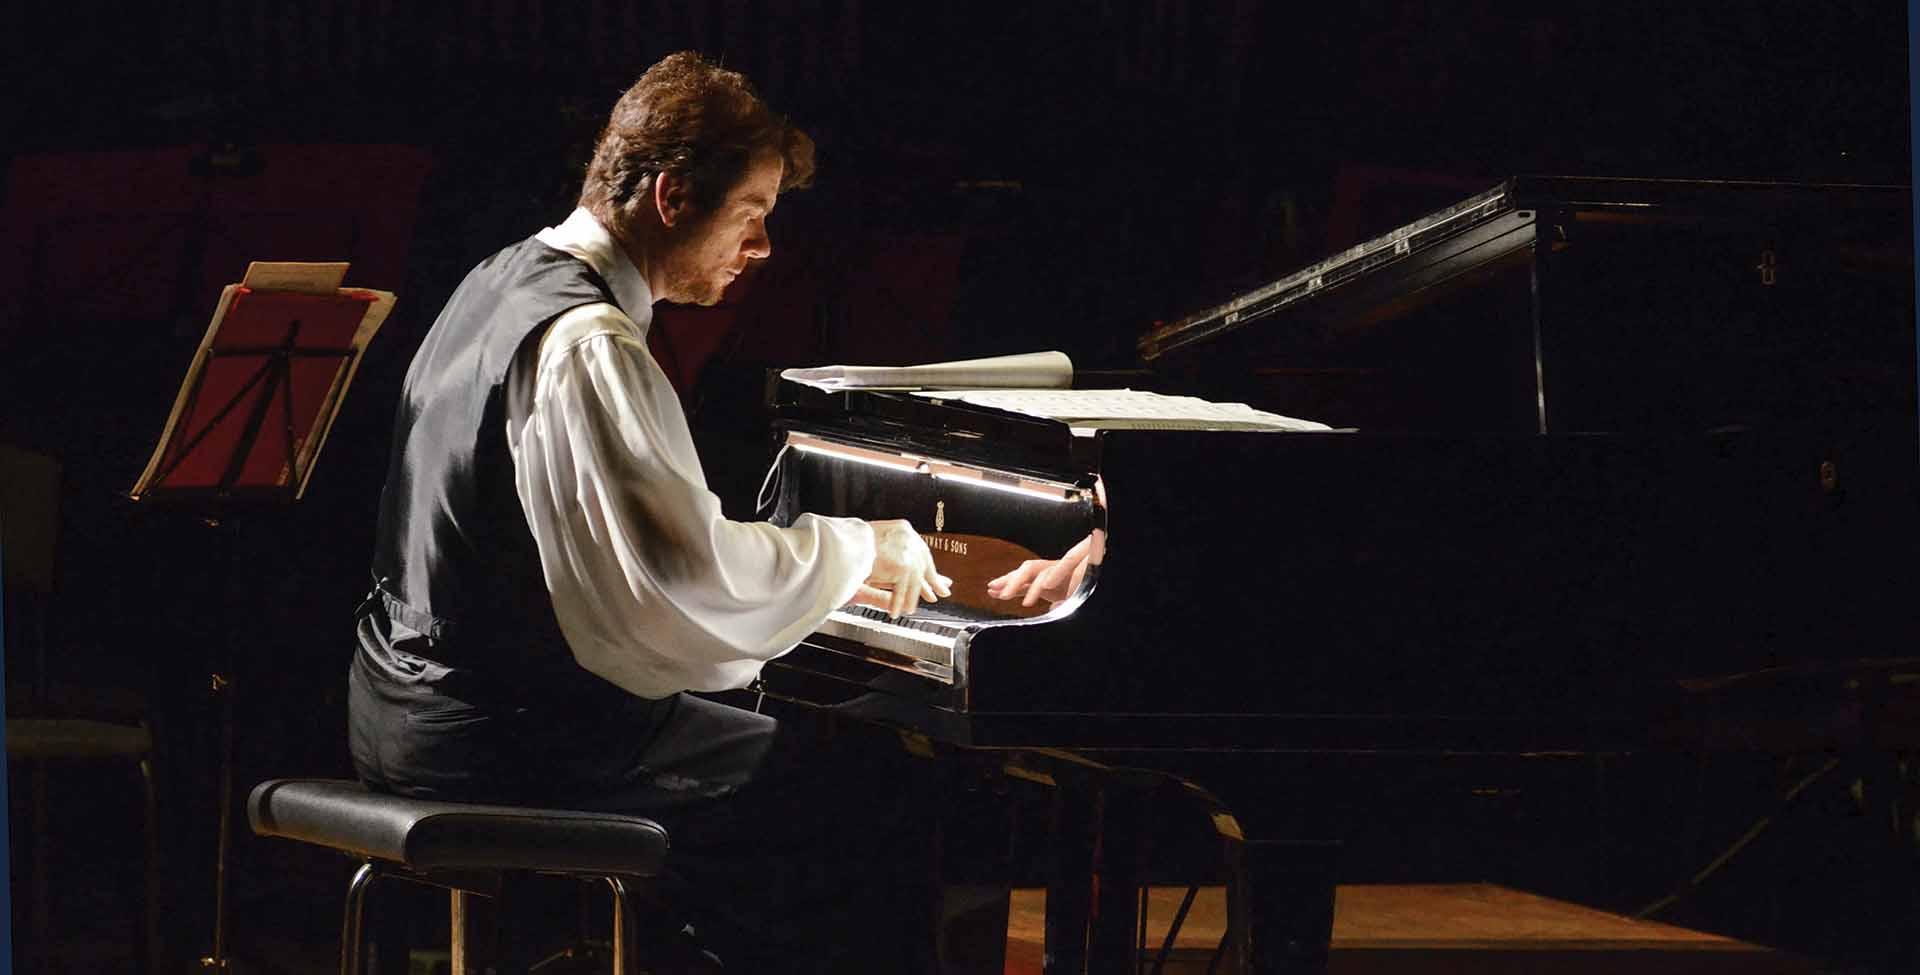 calvin jones piano